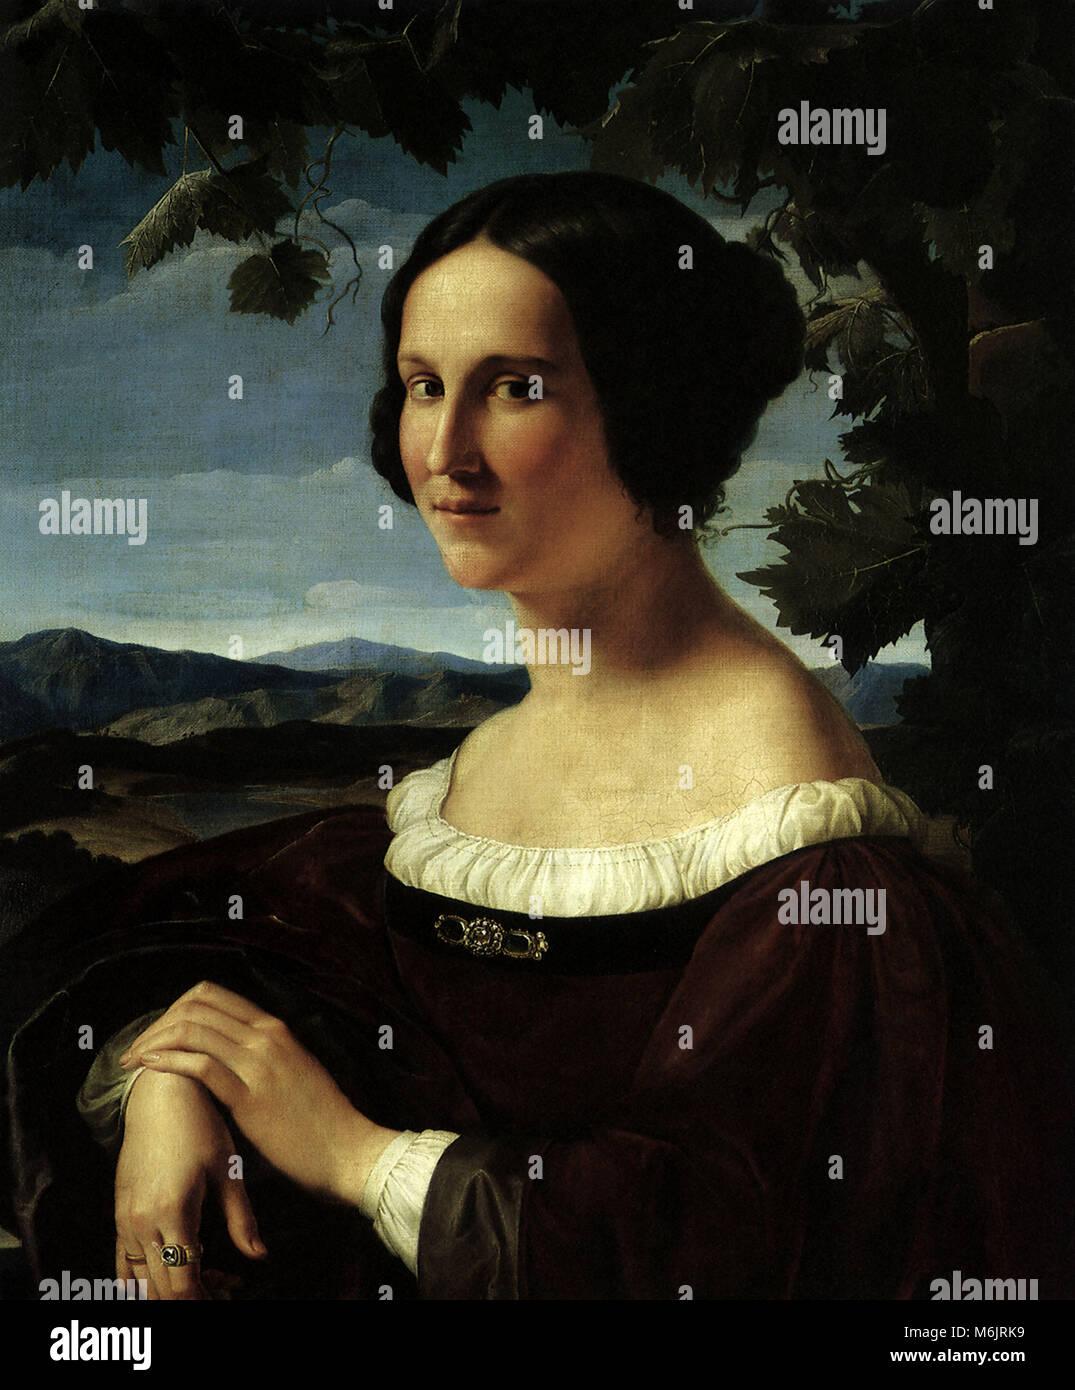 Ritratto di una giovane donna, Schadow, Friedrich Wilhelm von, 1832. Foto Stock